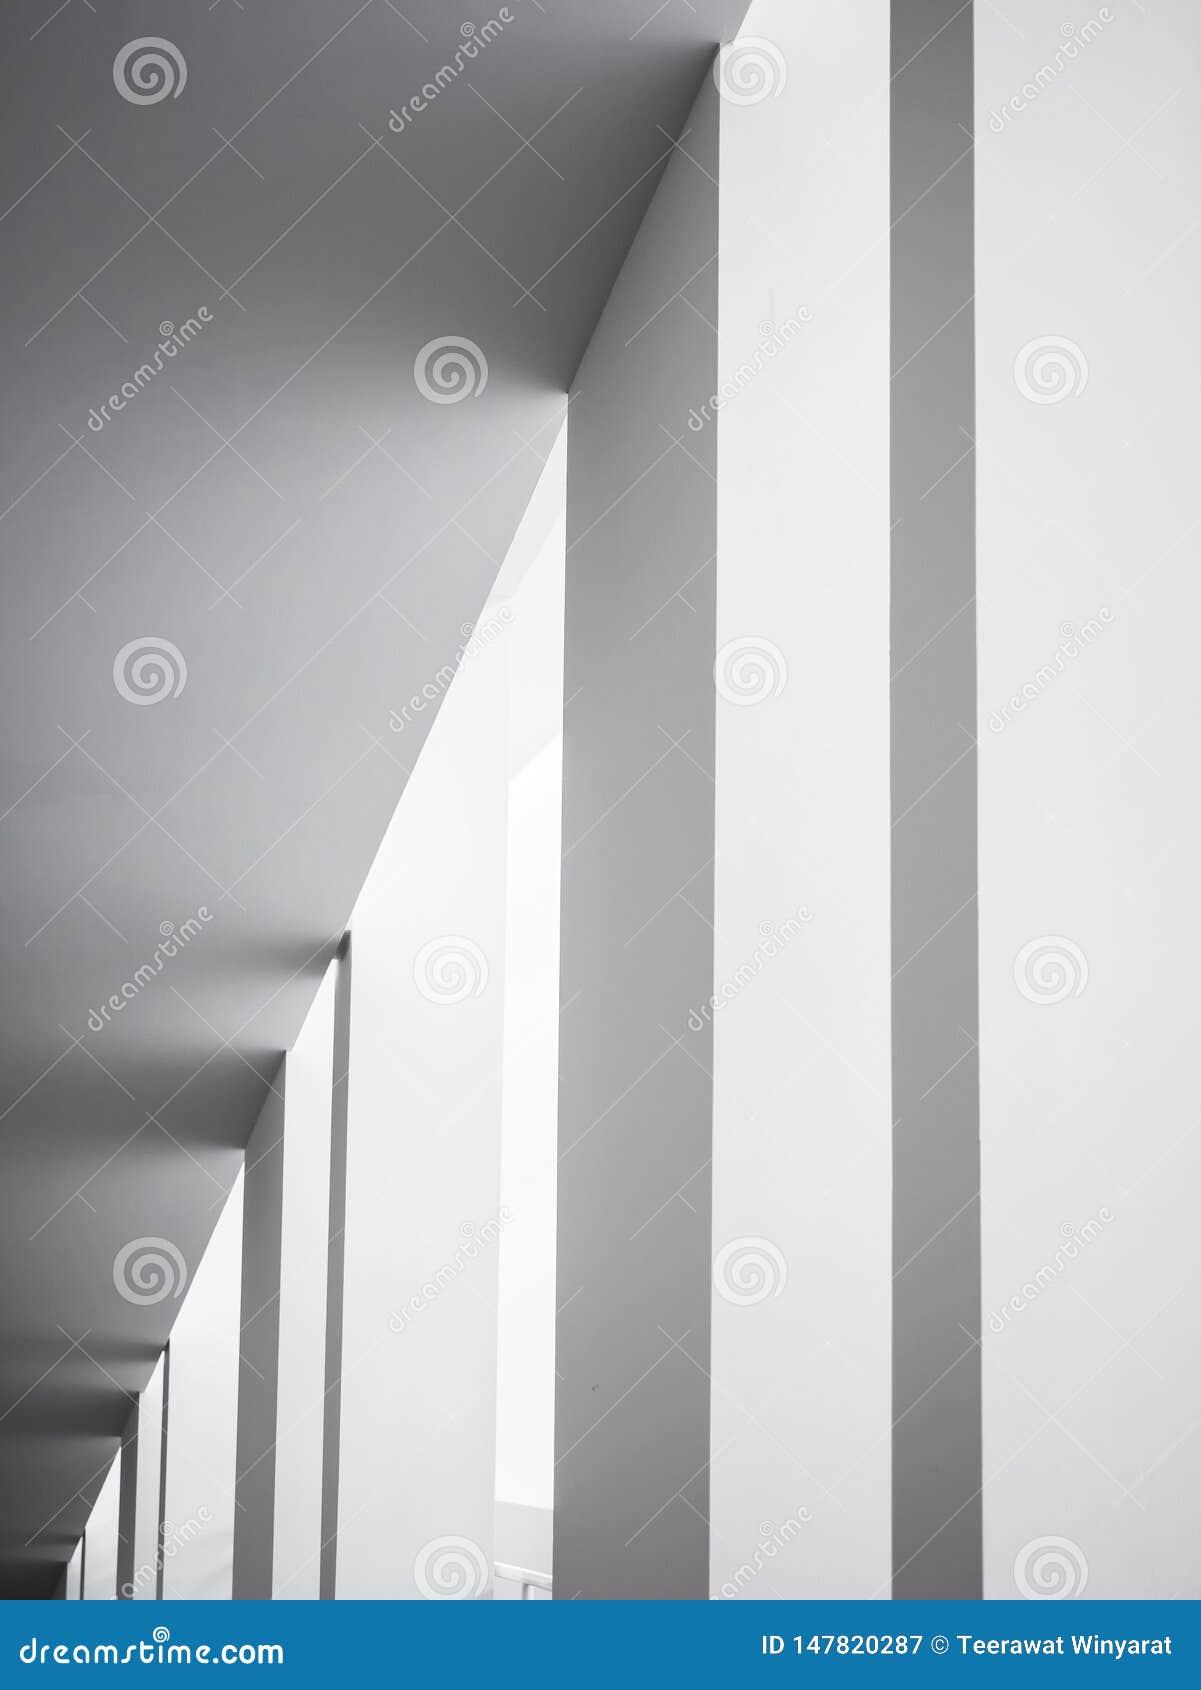 Bakgrund f?r vit byggnad f?r kolonner f?r arkitekturdetaljer geometrisk abstrakt modern